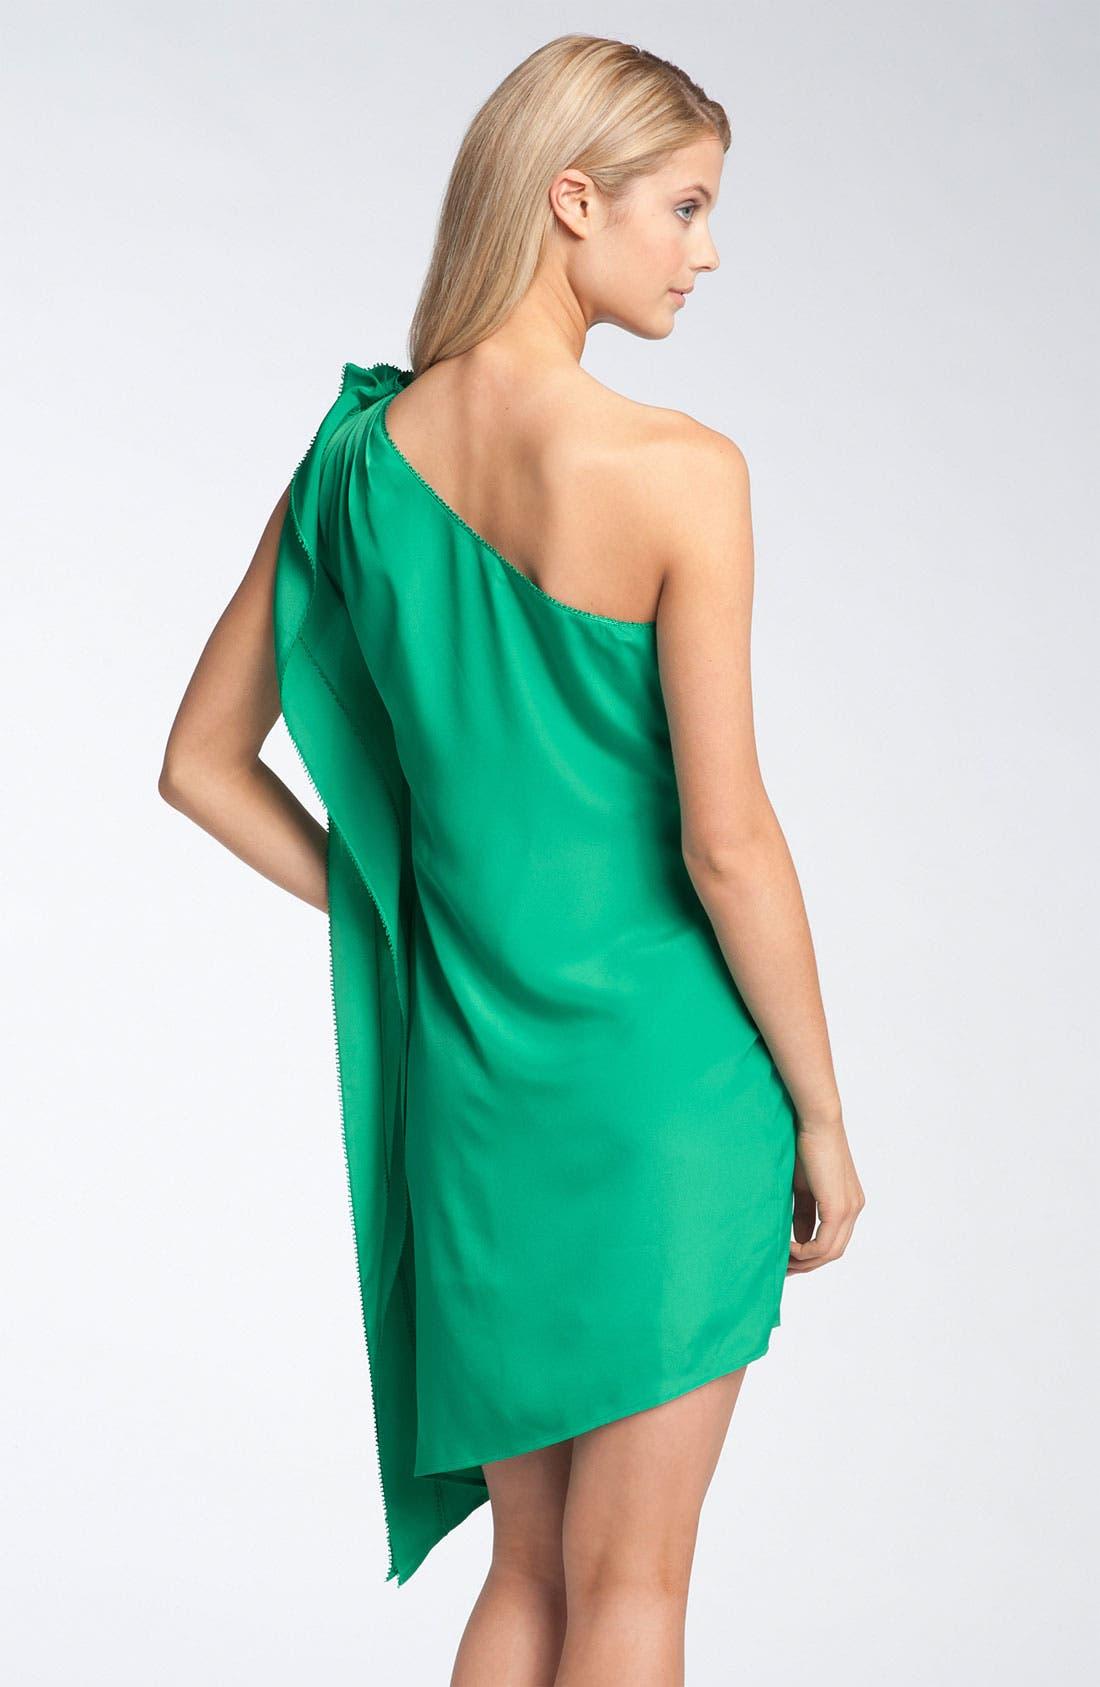 JESSICA SIMPSON,                             One Shoulder Ruffle Dress,                             Alternate thumbnail 3, color,                             310